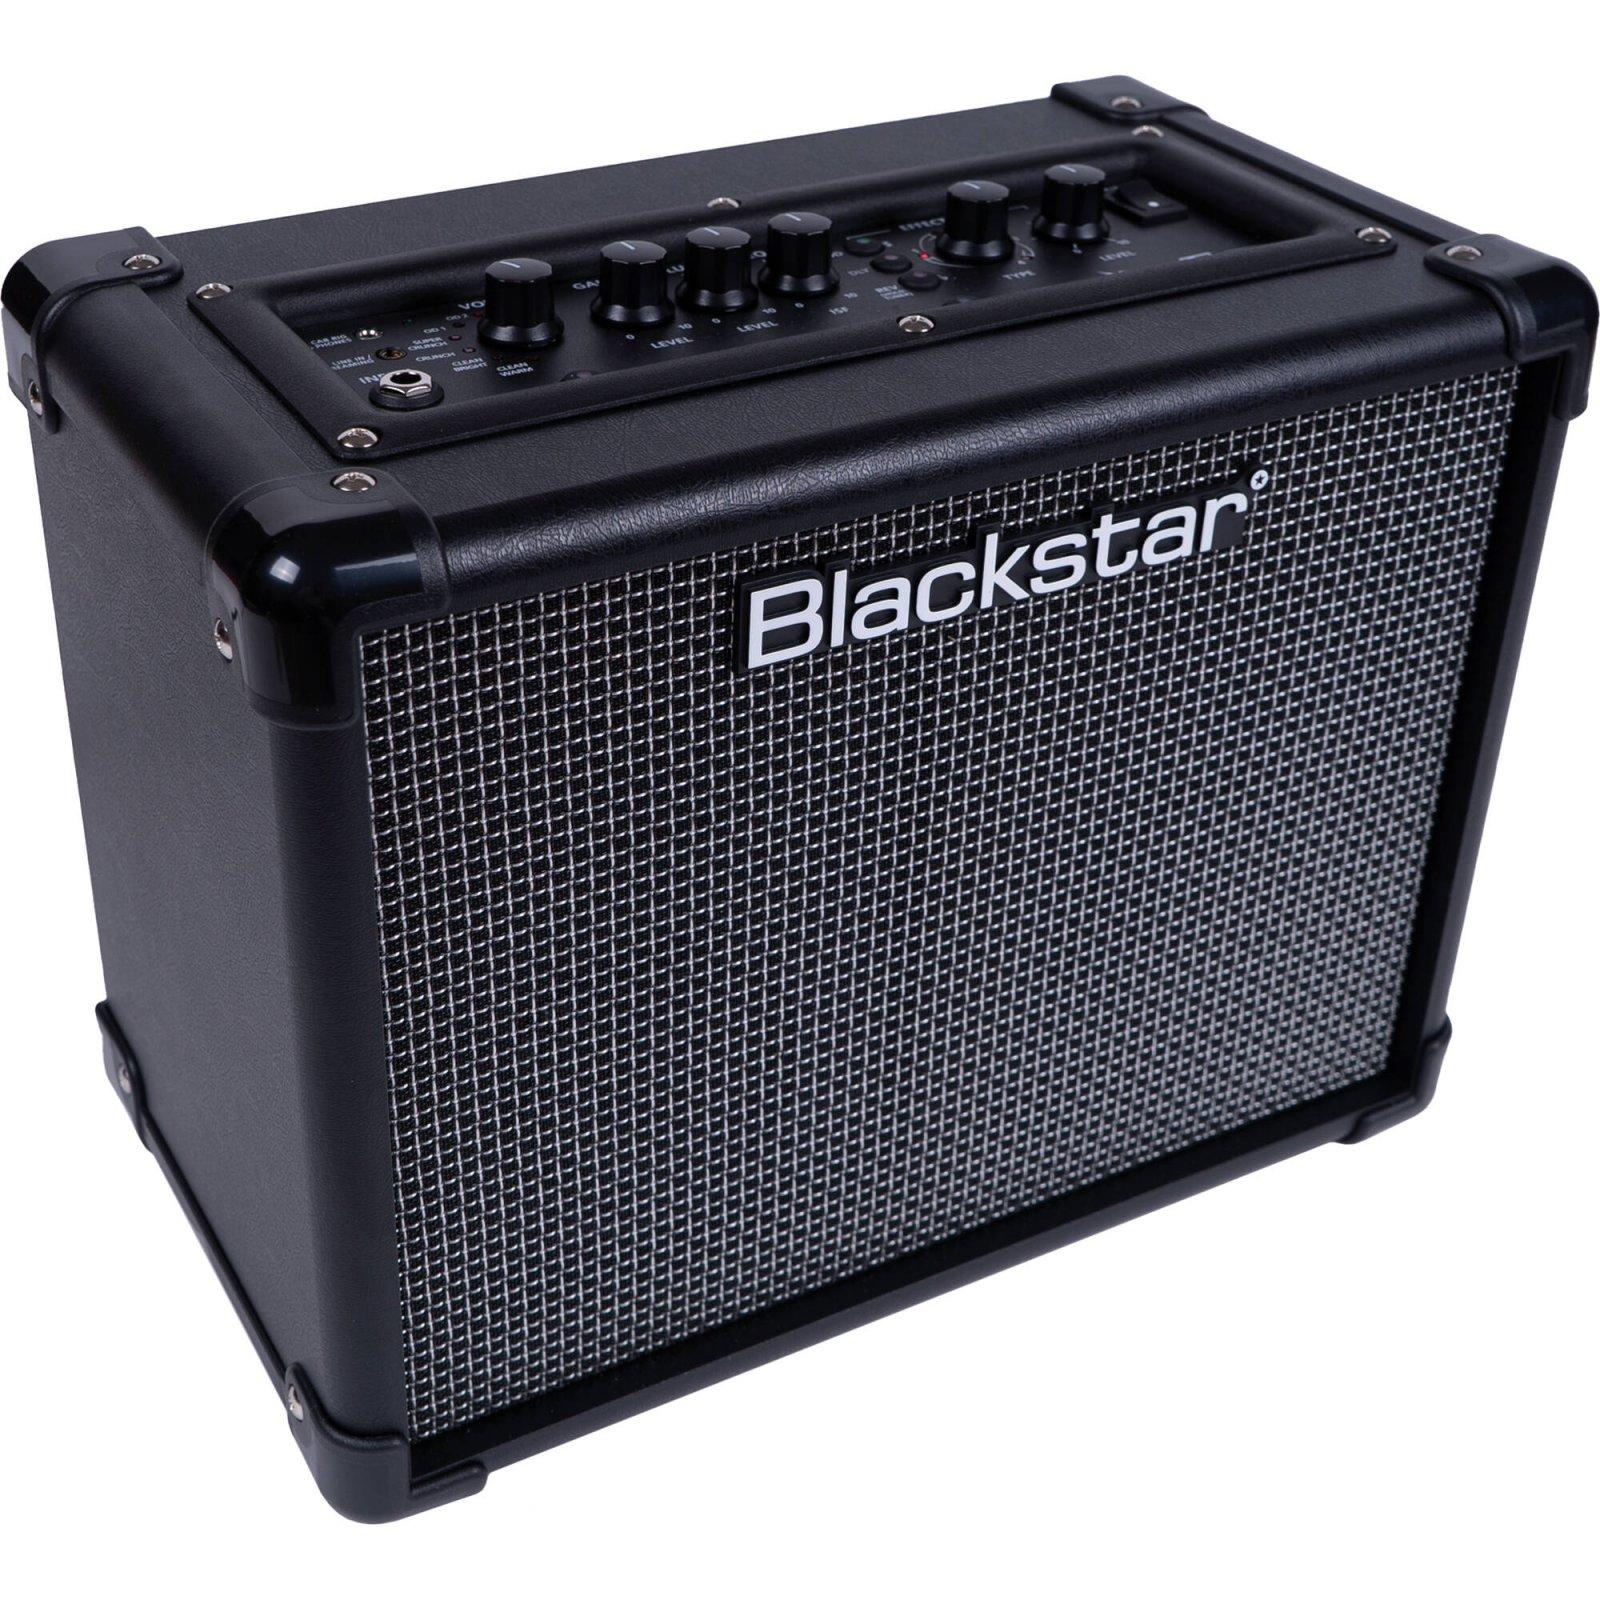 Blackstar ID:Core 20 V3 2 x 5-inch, 2 x 10-watt Stereo Combo Amp with Effects